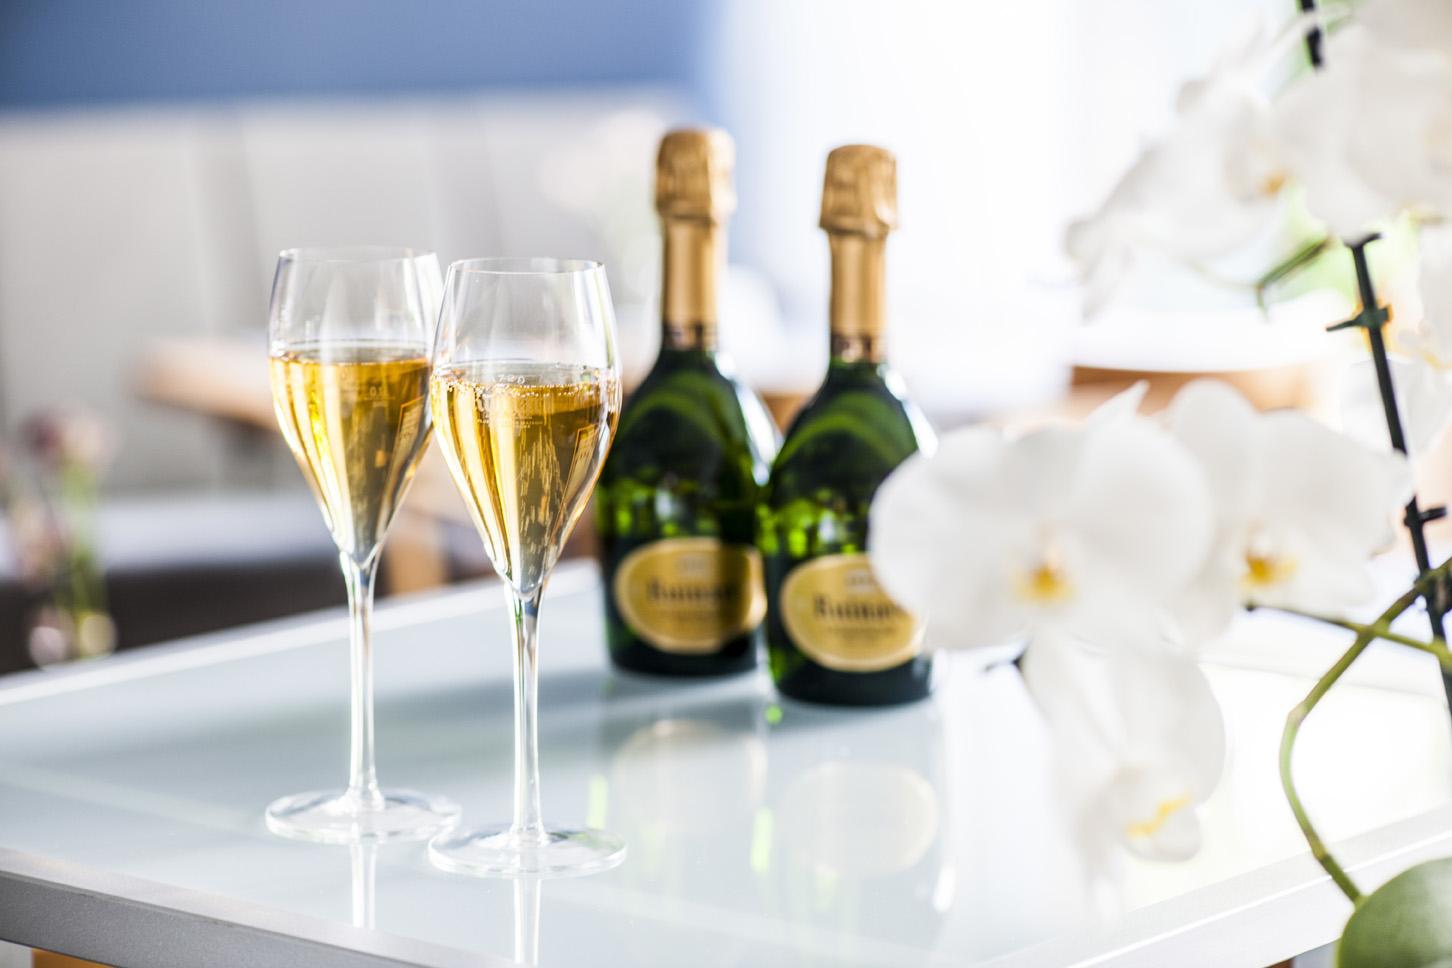 Rh champagnertraeume small original 354788